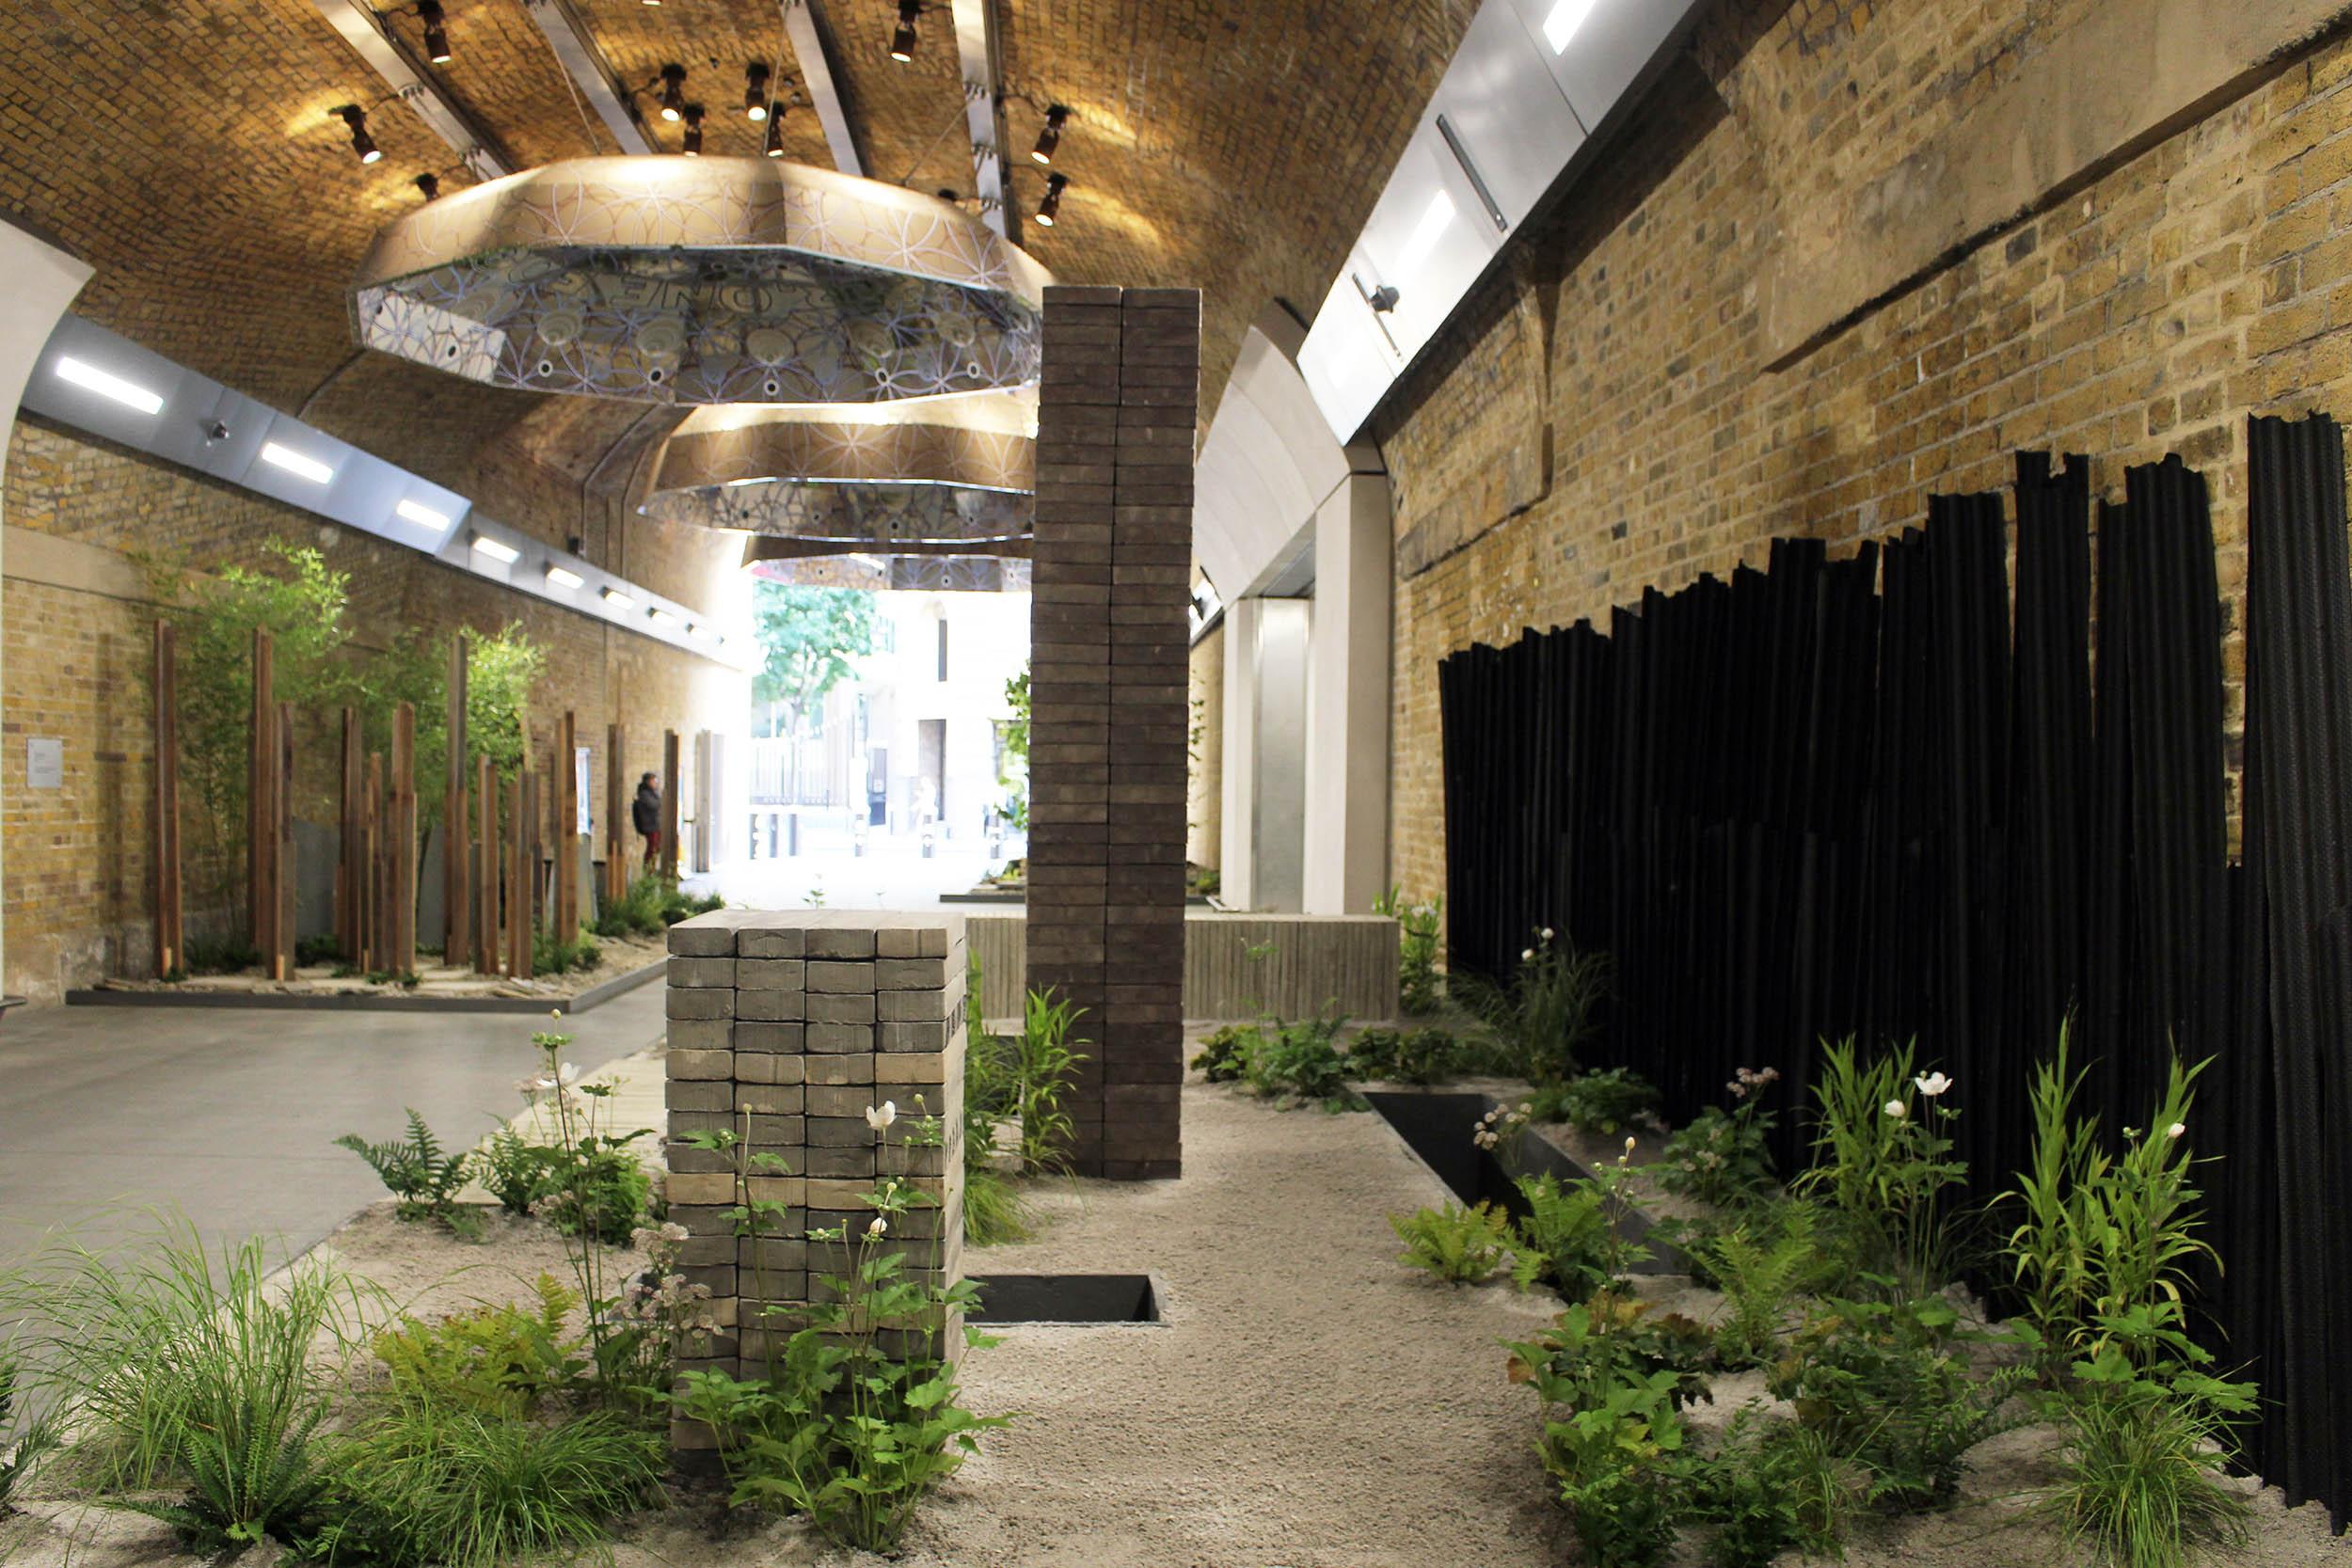 london-bridge-station-temporary-popup-garden-installation.jpg